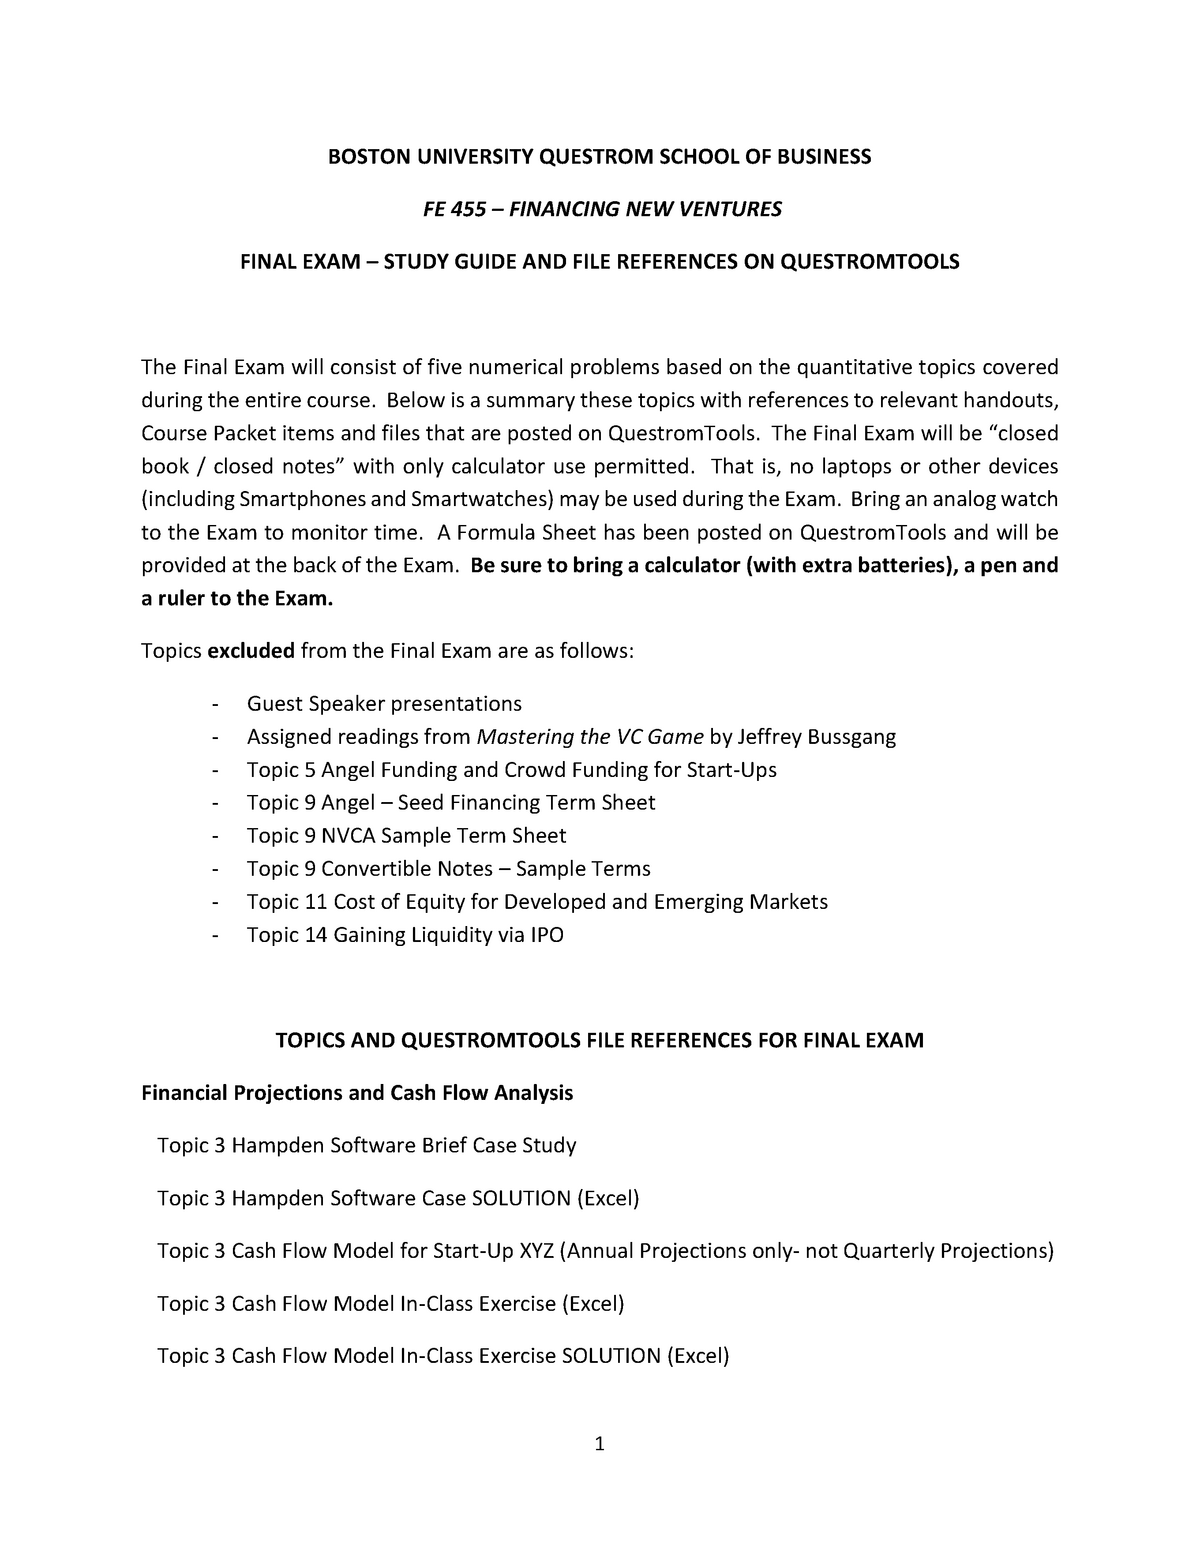 FE 455 Final Exam Study Guide and File References - BU - StuDocu